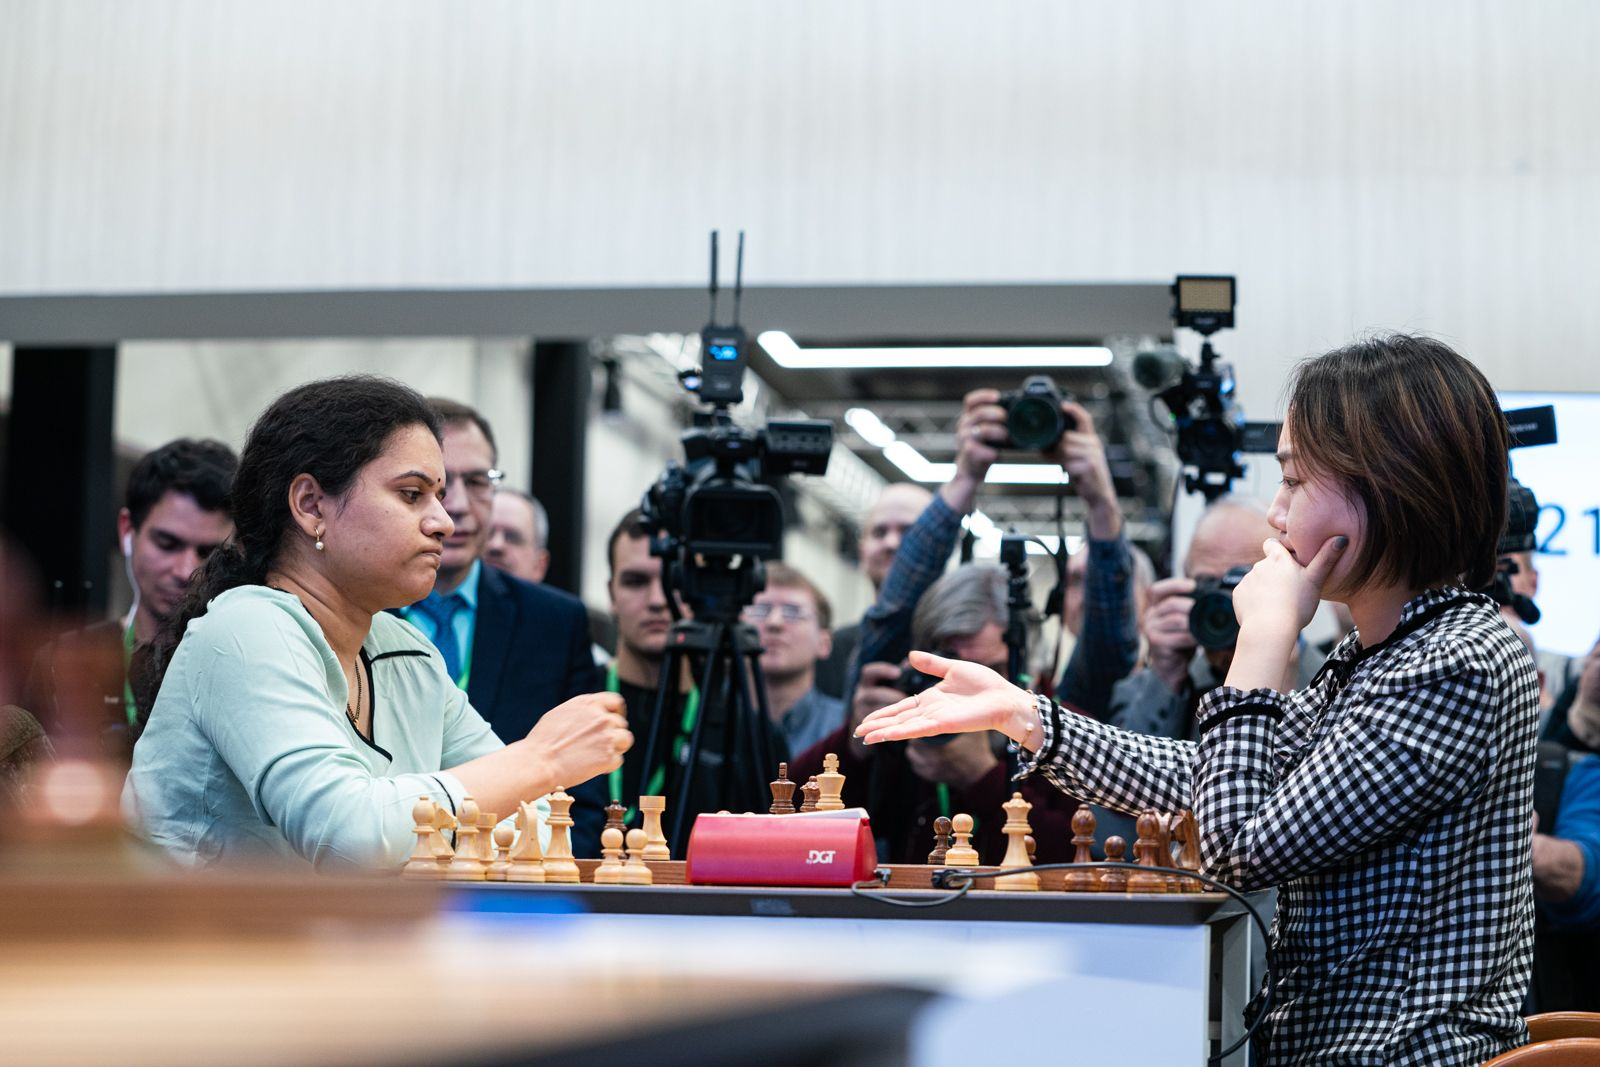 Humpy Koneru Lei Tingjie 2021 World Rapid Chess Championship